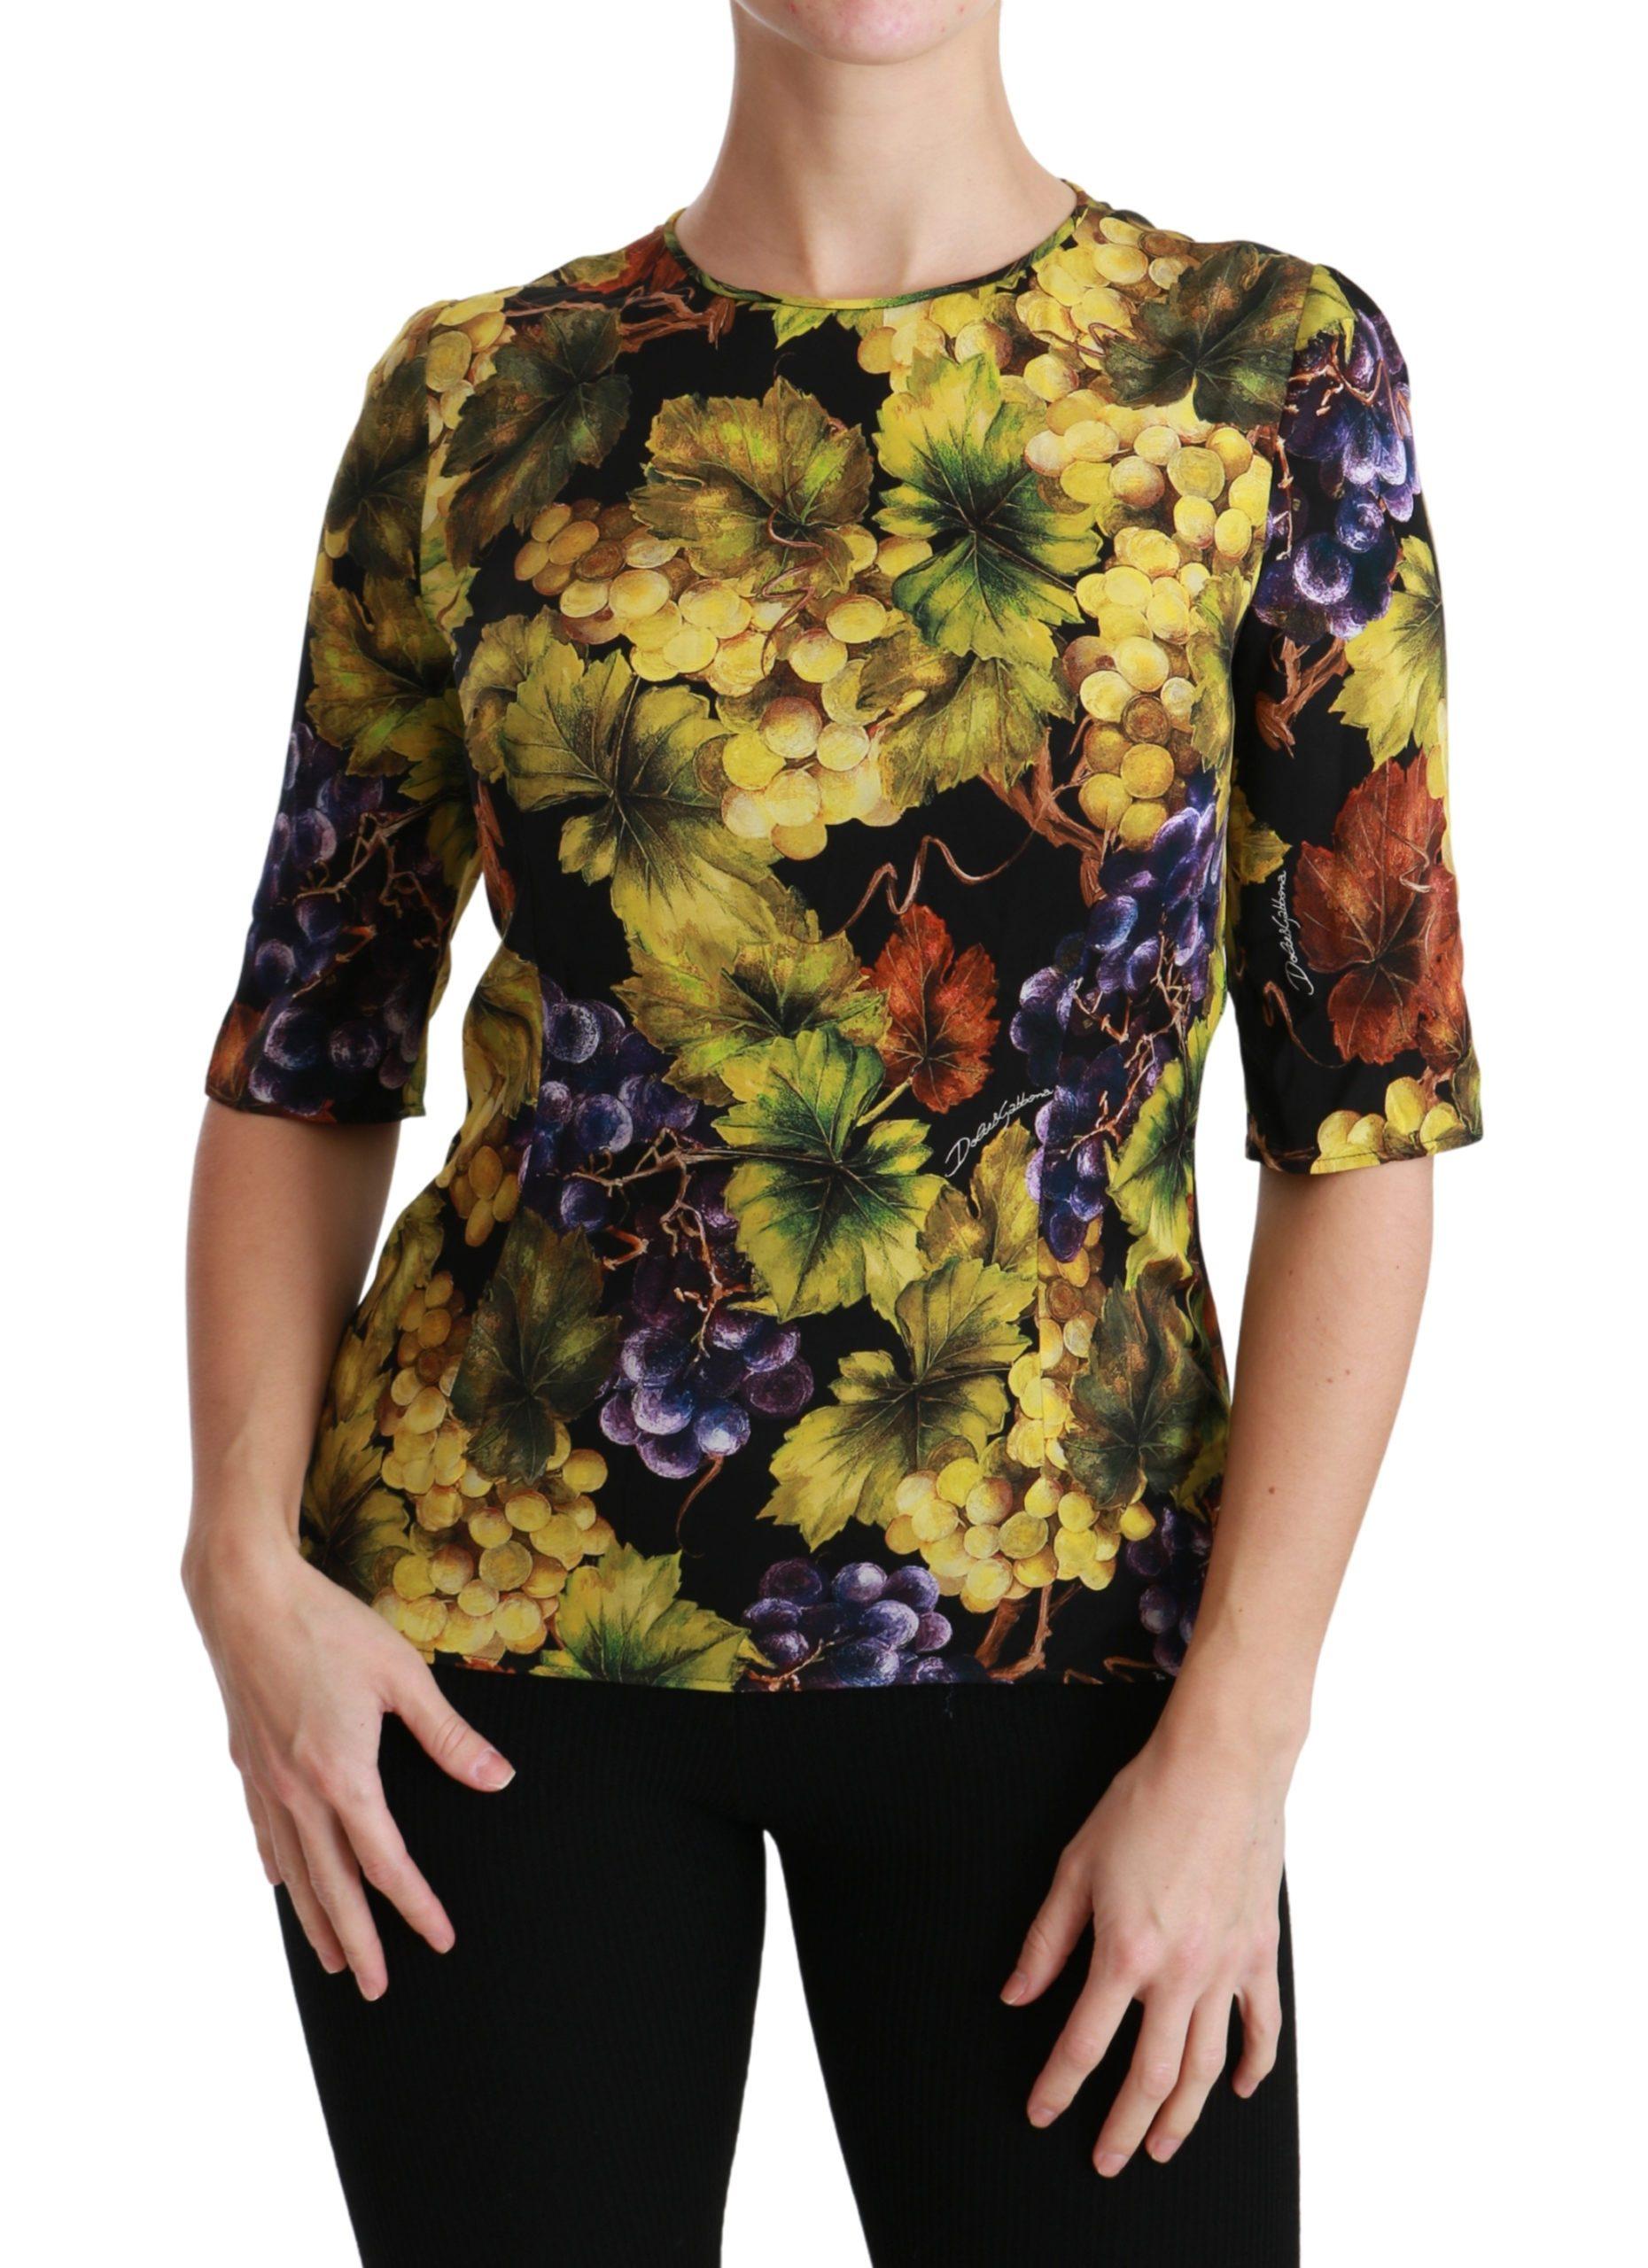 Dolce & Gabbana Women's Grape Floral Stretch Top Black TSH4475 - IT38 | S